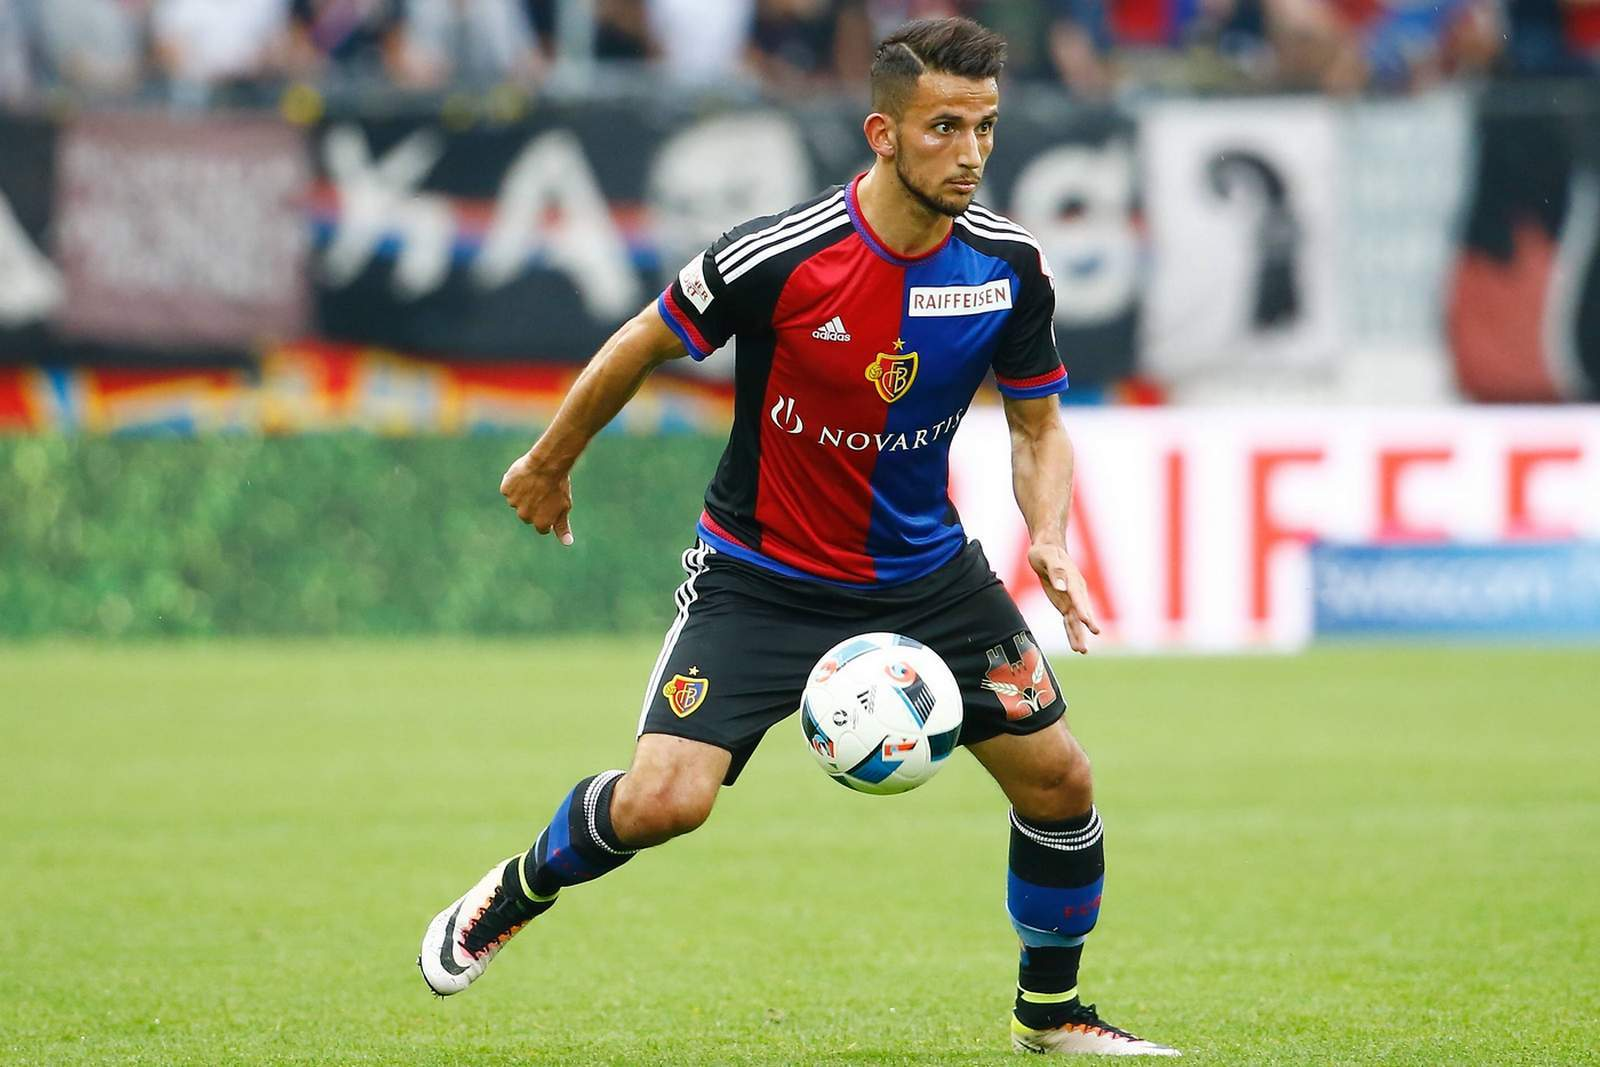 Naser Aliji vom FC Basel